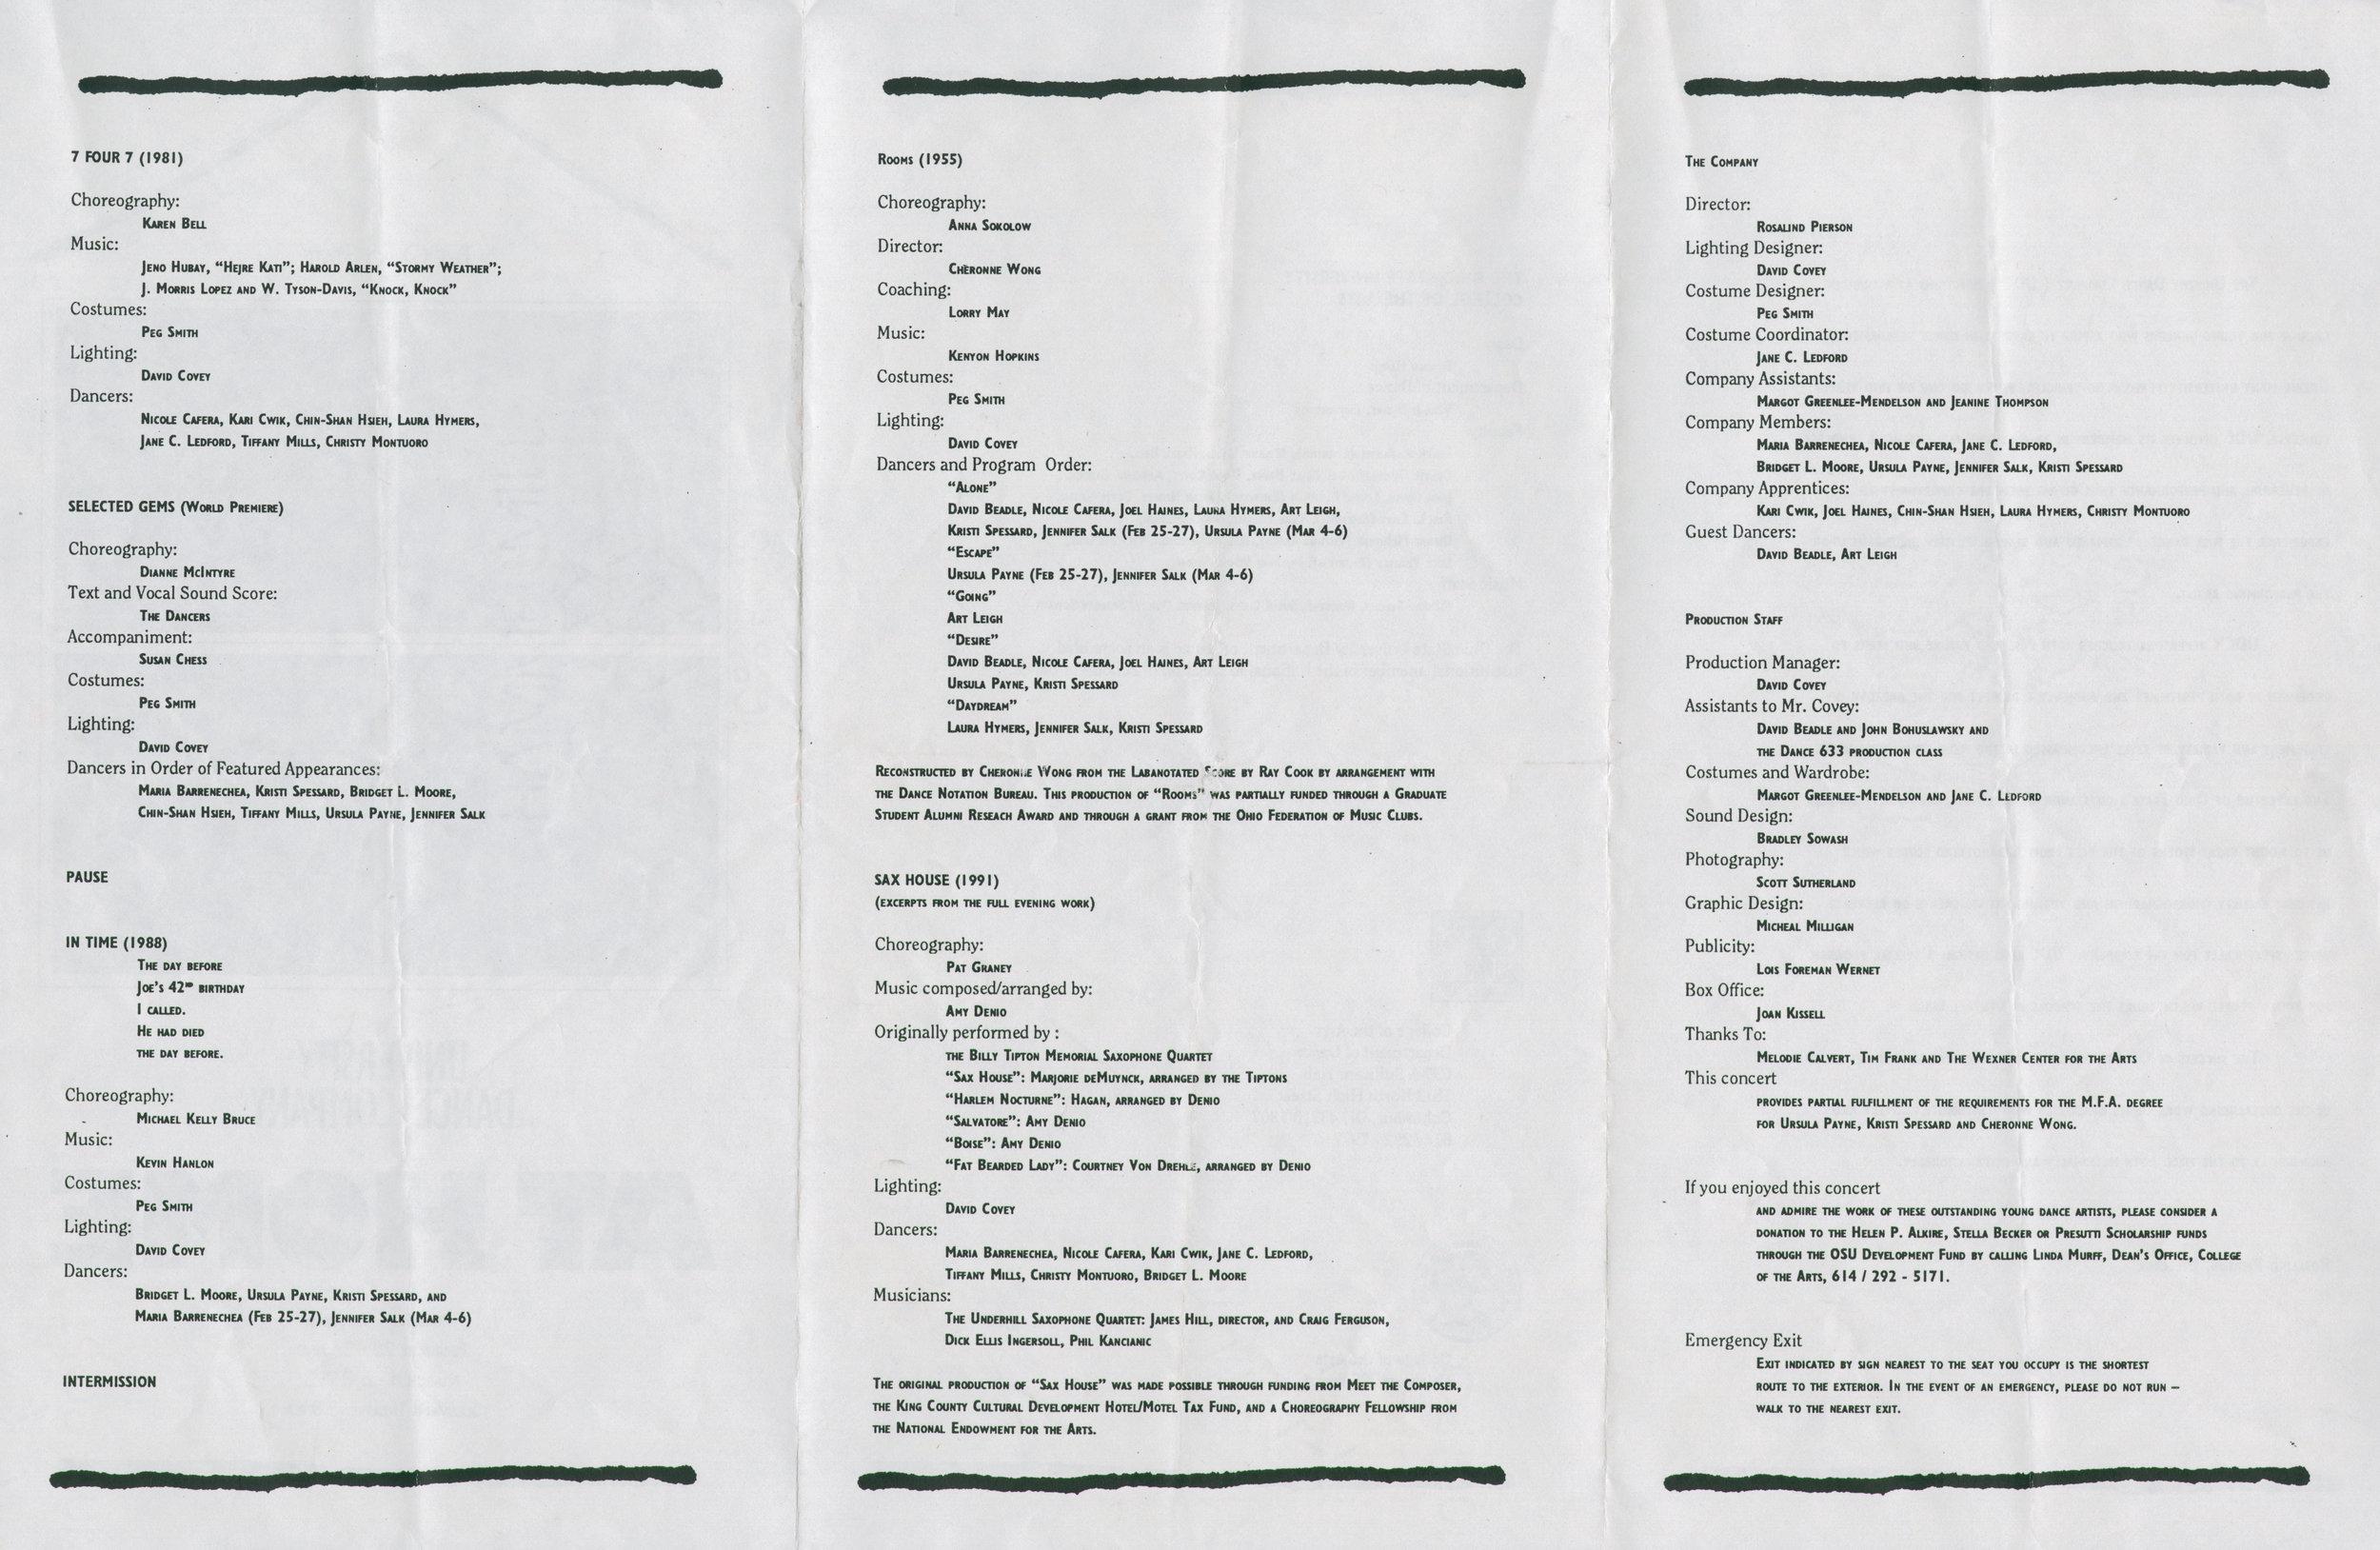 UDC_1993_DancePrograms-024-002.jpg